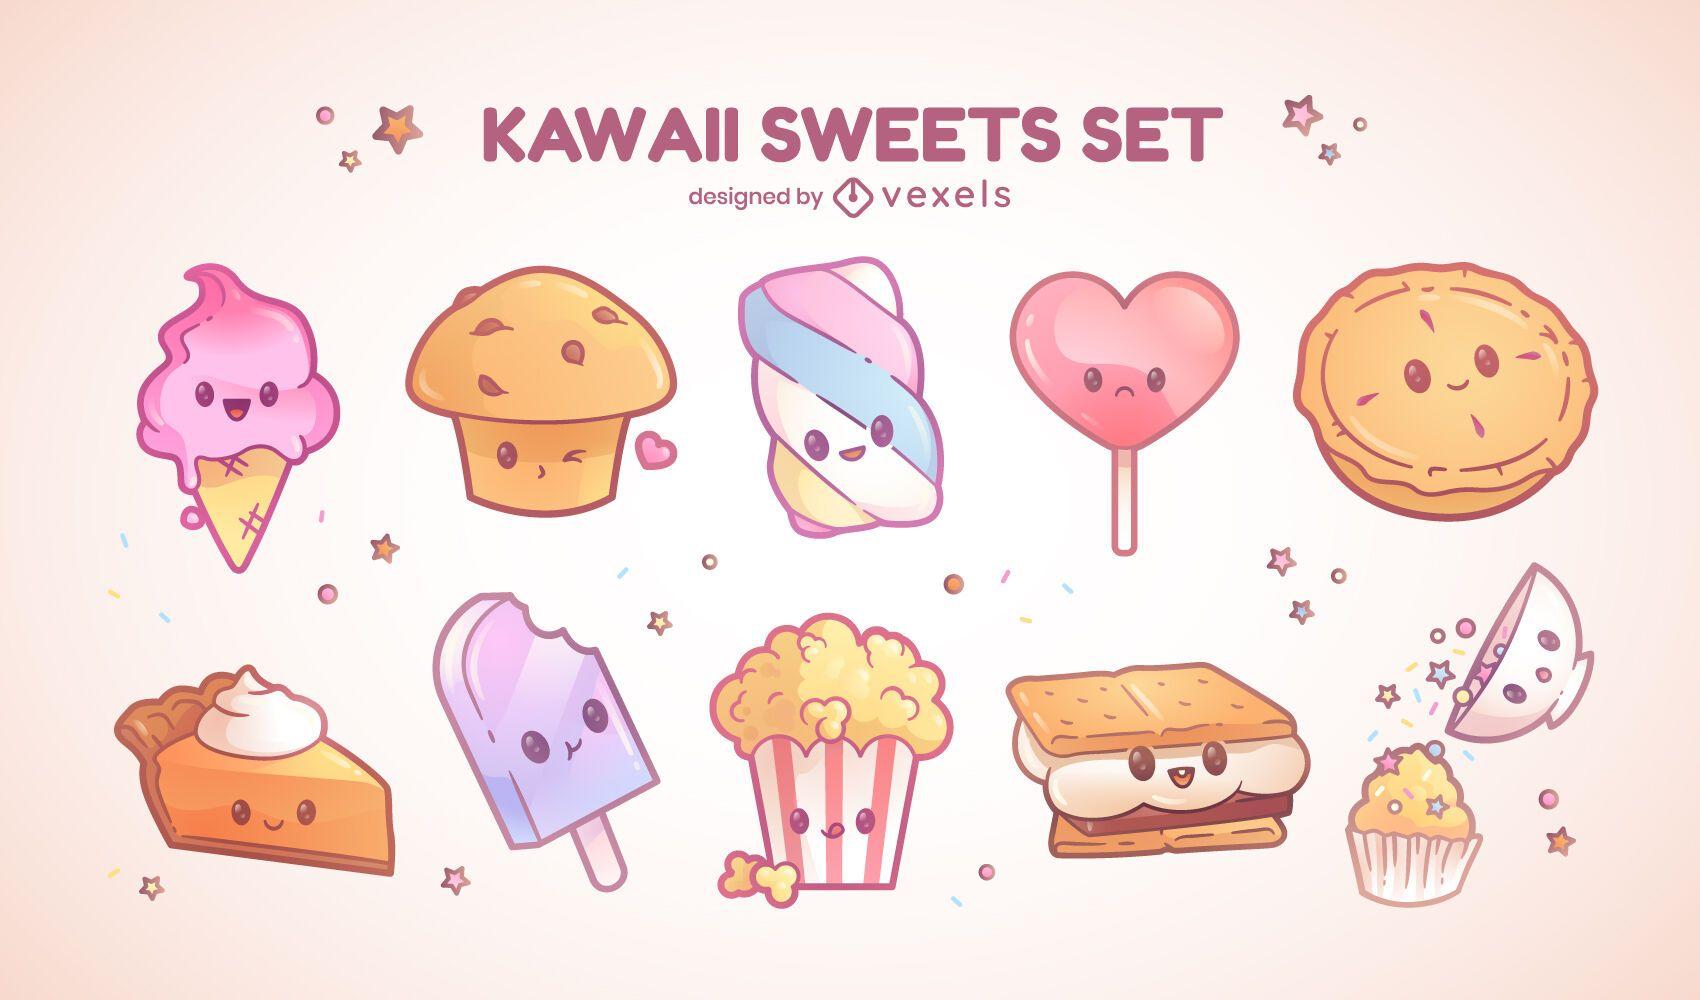 Sweet kawaii characters set